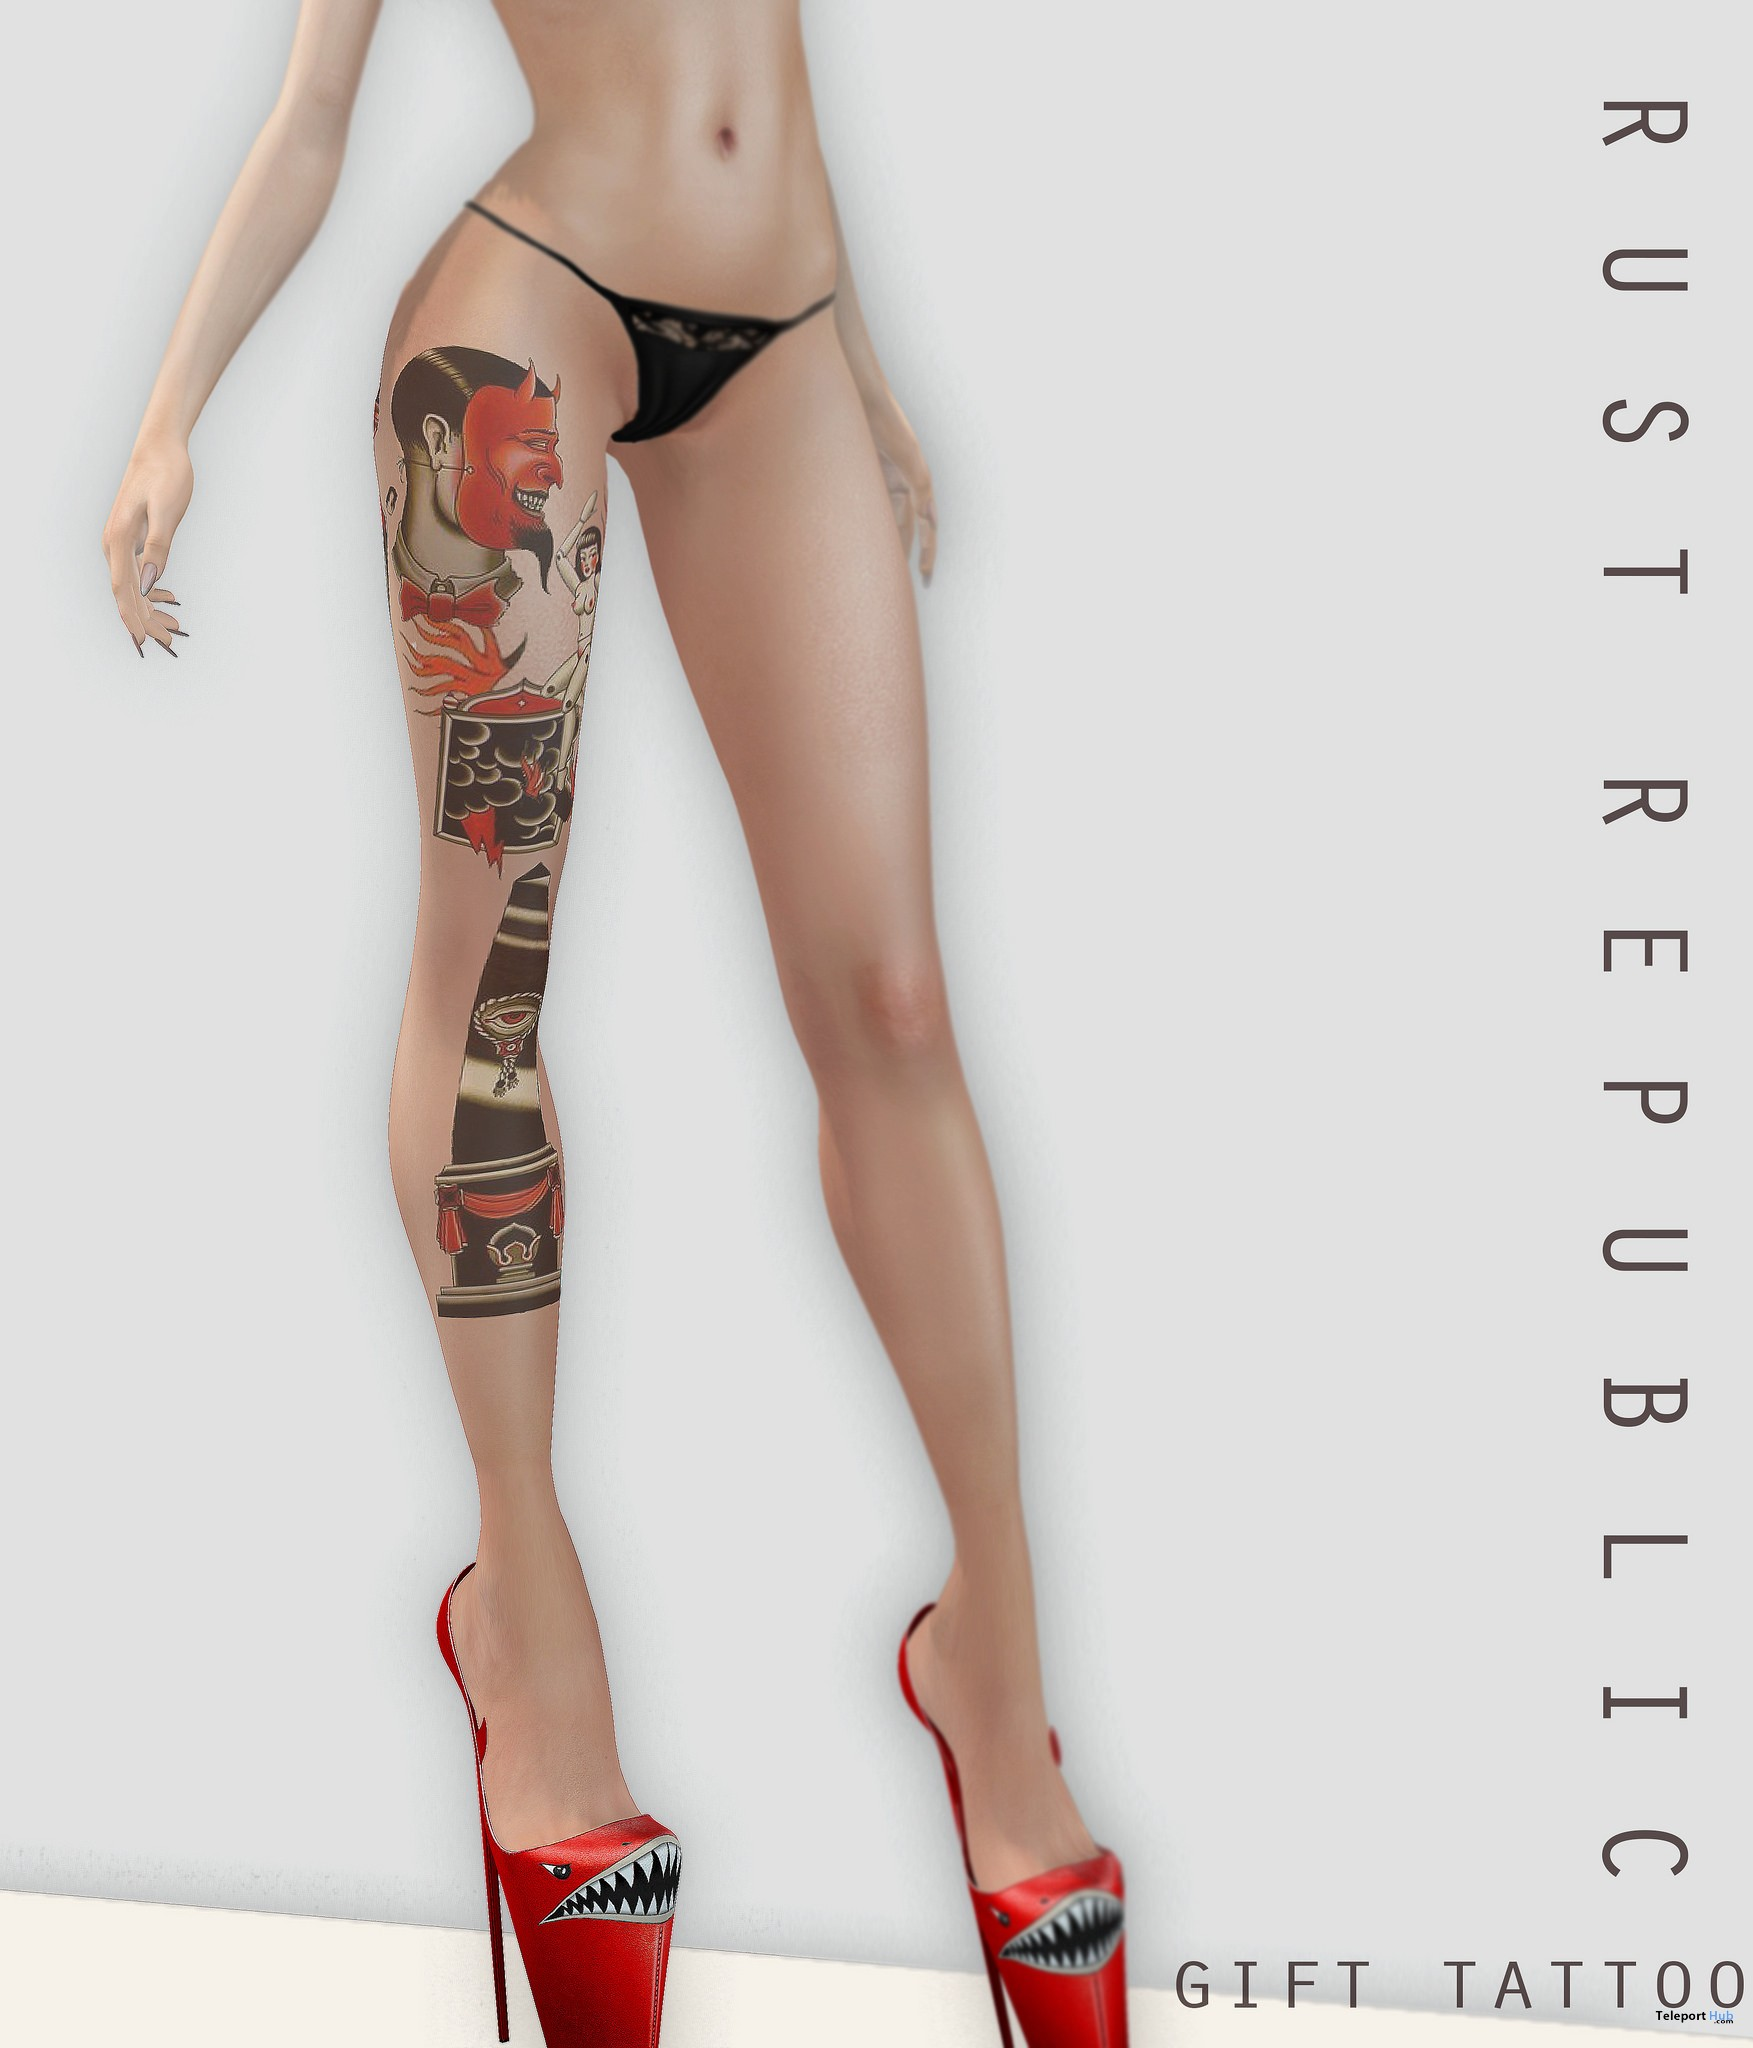 Red & Black Leg Tattoo 1L Promo Gift by Rust Republic - Teleport Hub - teleporthub.com